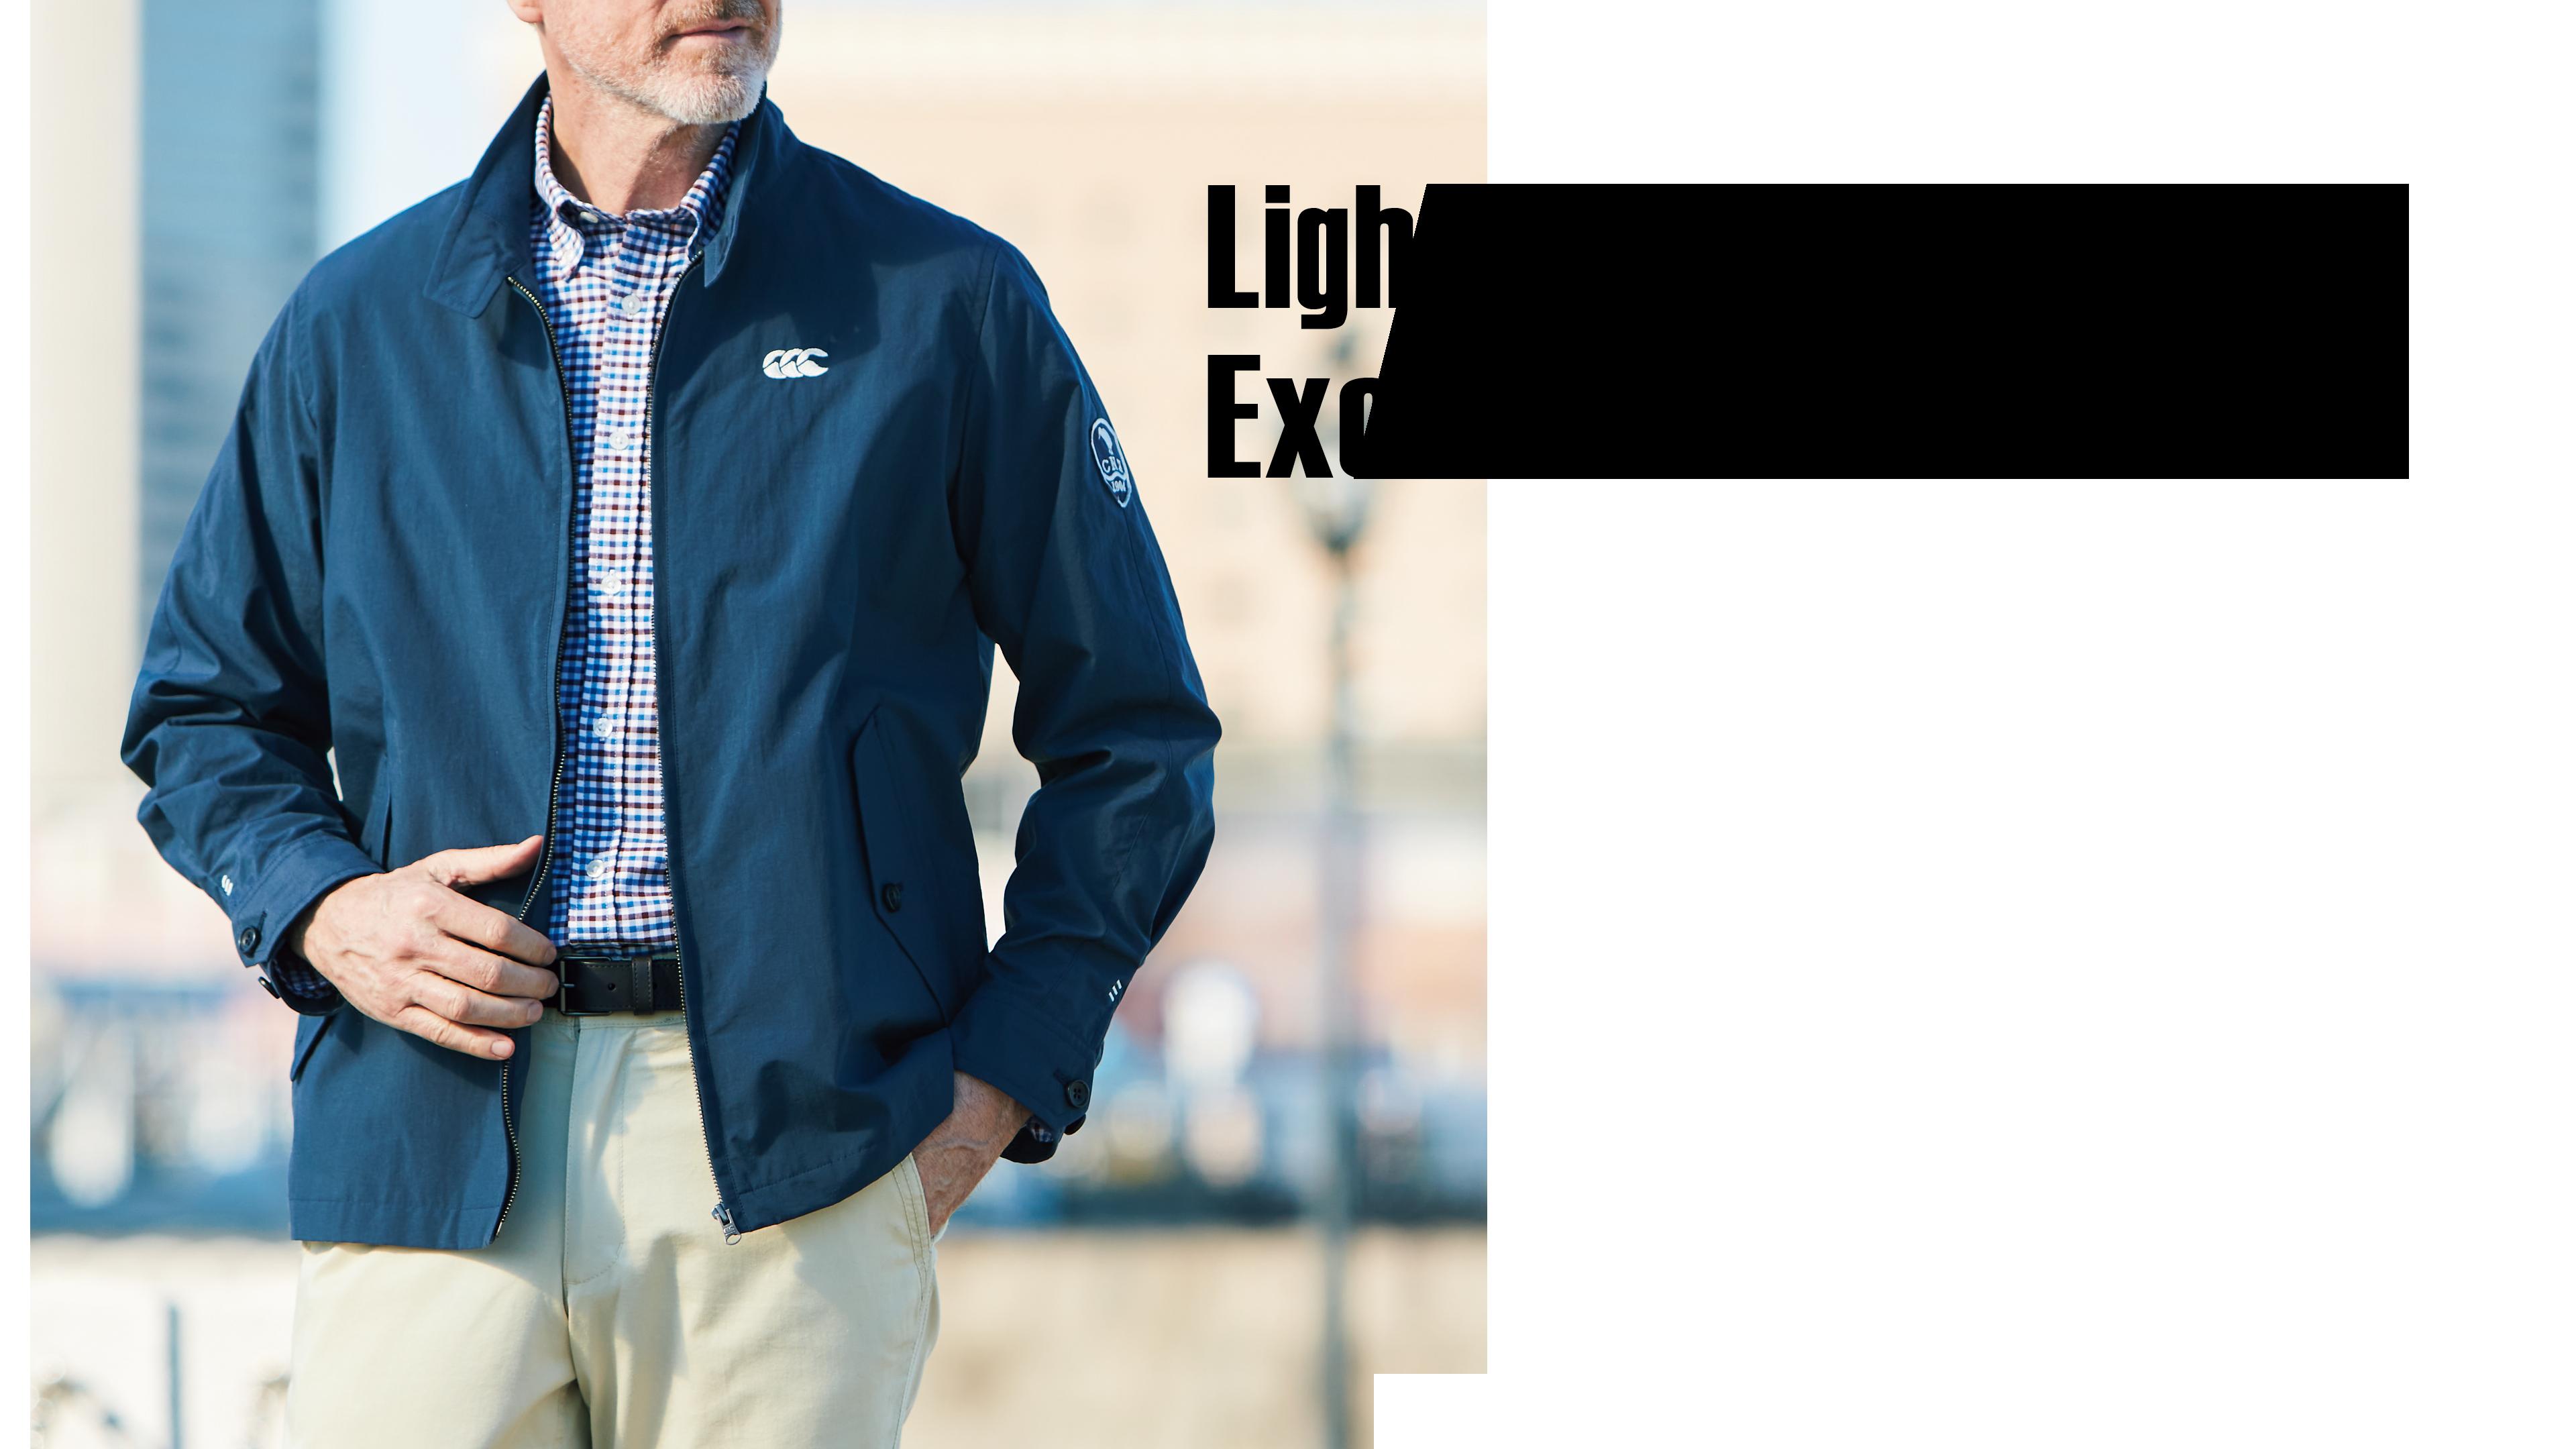 LightUp Shopping Club 撥水、軽量で使いやすい。当社だけの限定仕様。